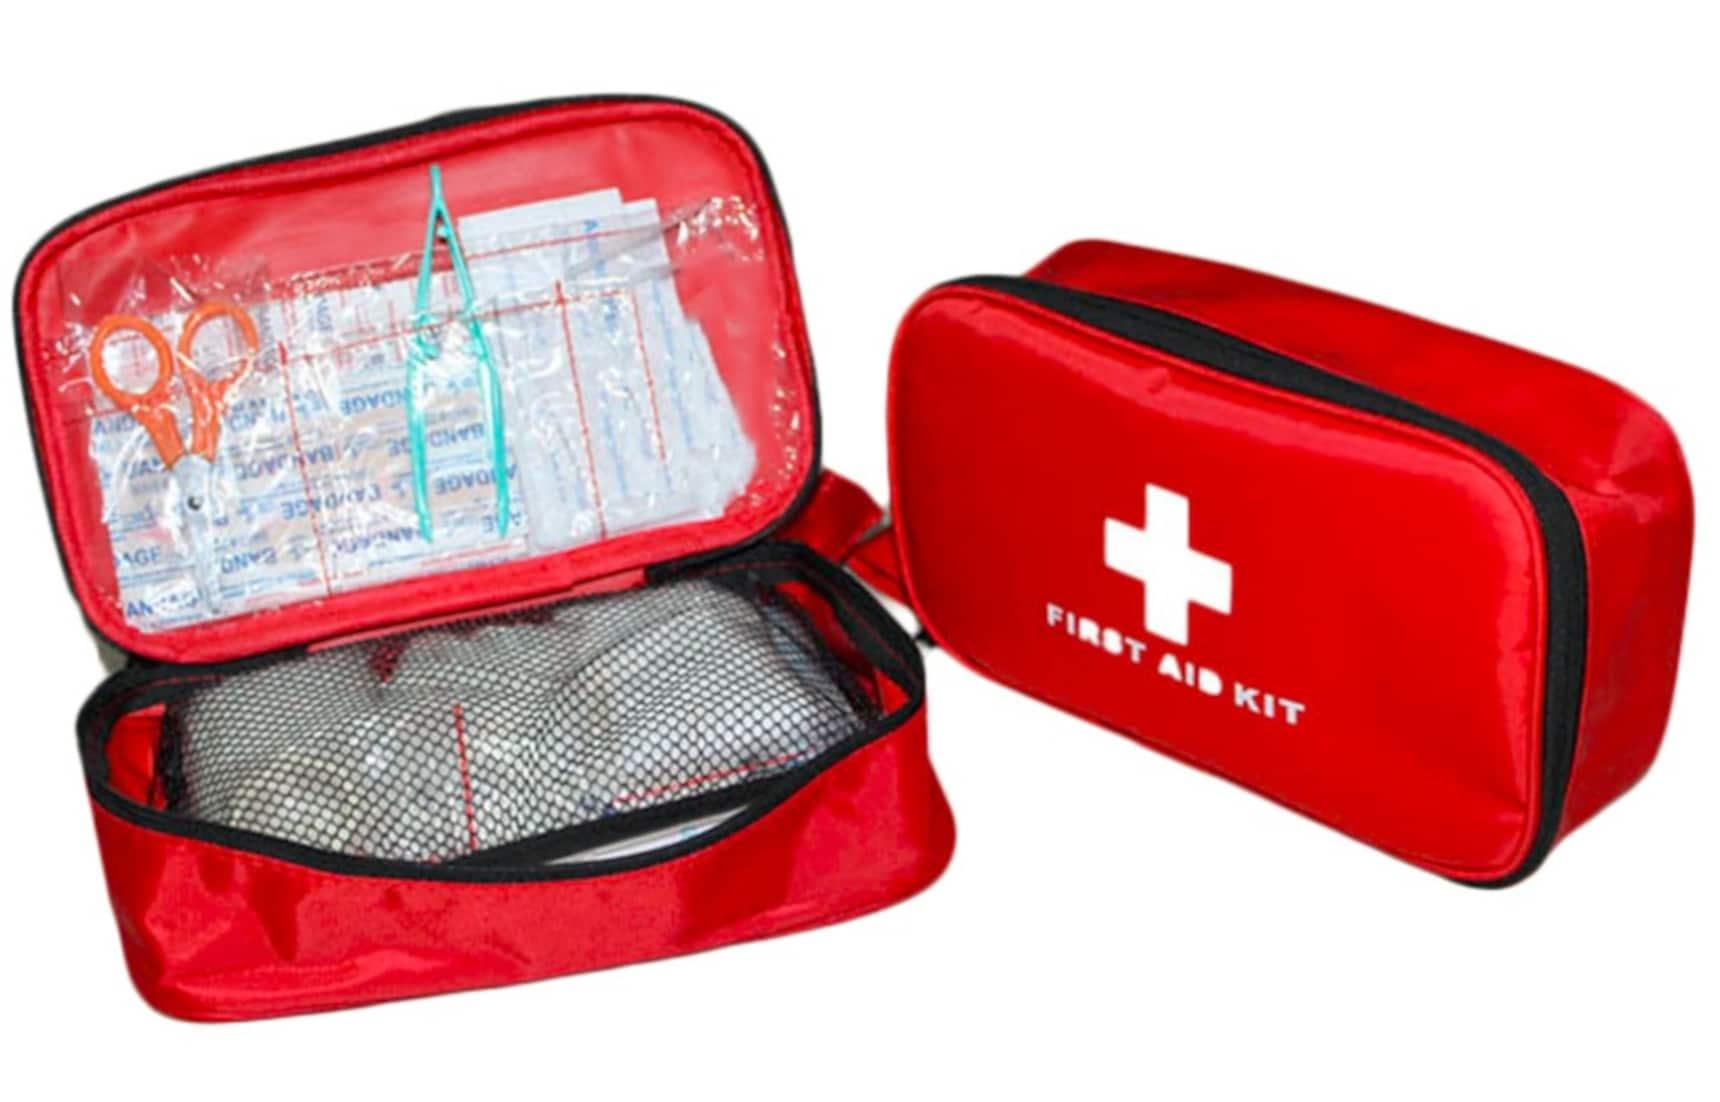 Build an Earthquake Kit at the ¥100 Shop